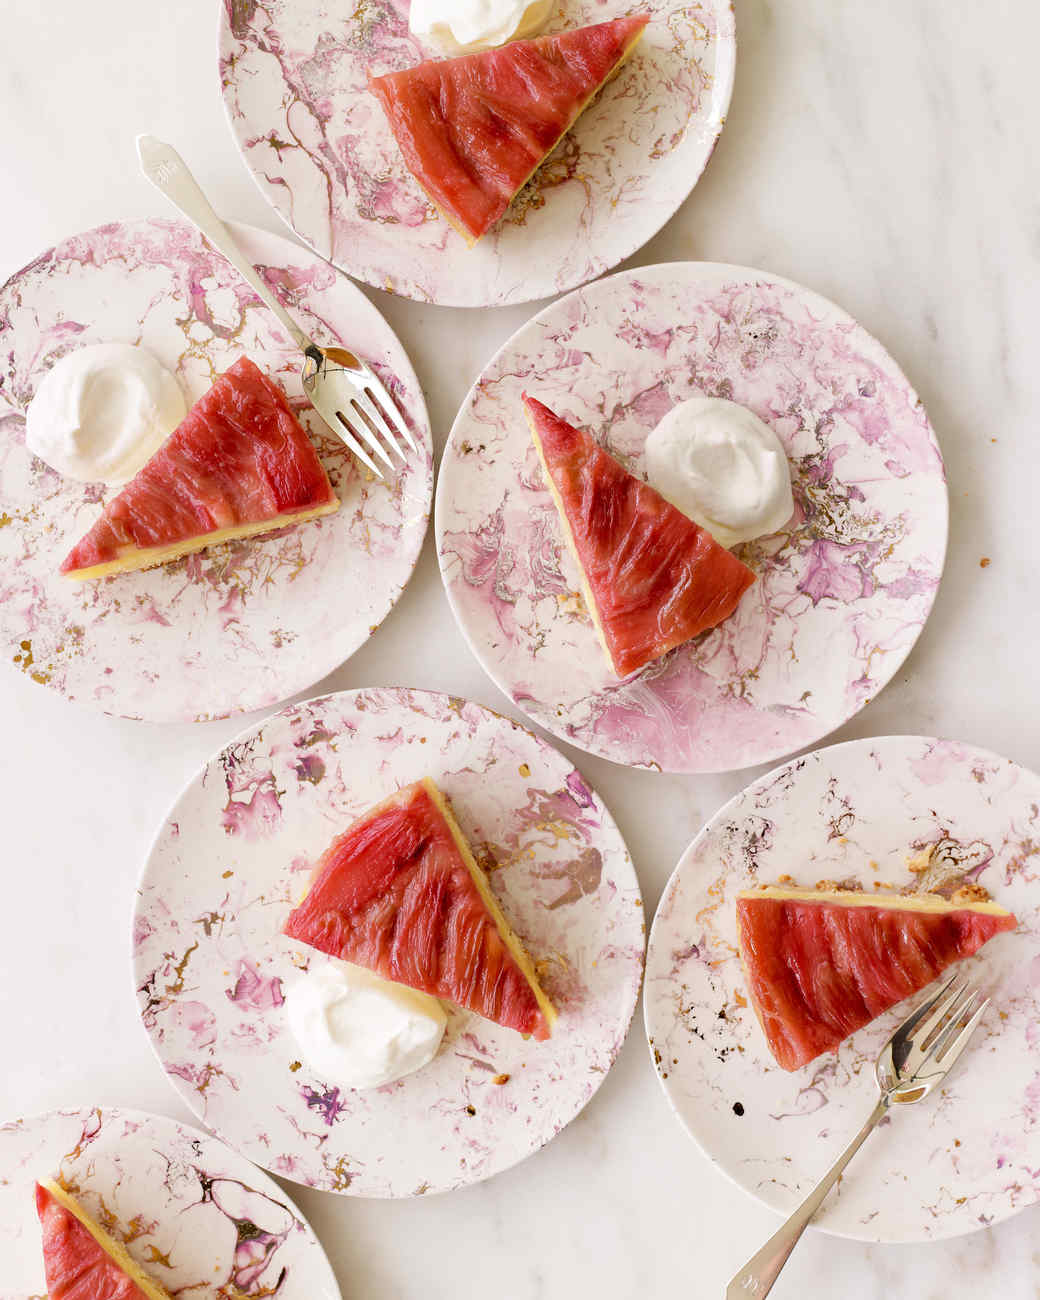 rhubarb-upside-down-cake-mhlb2001.jpg